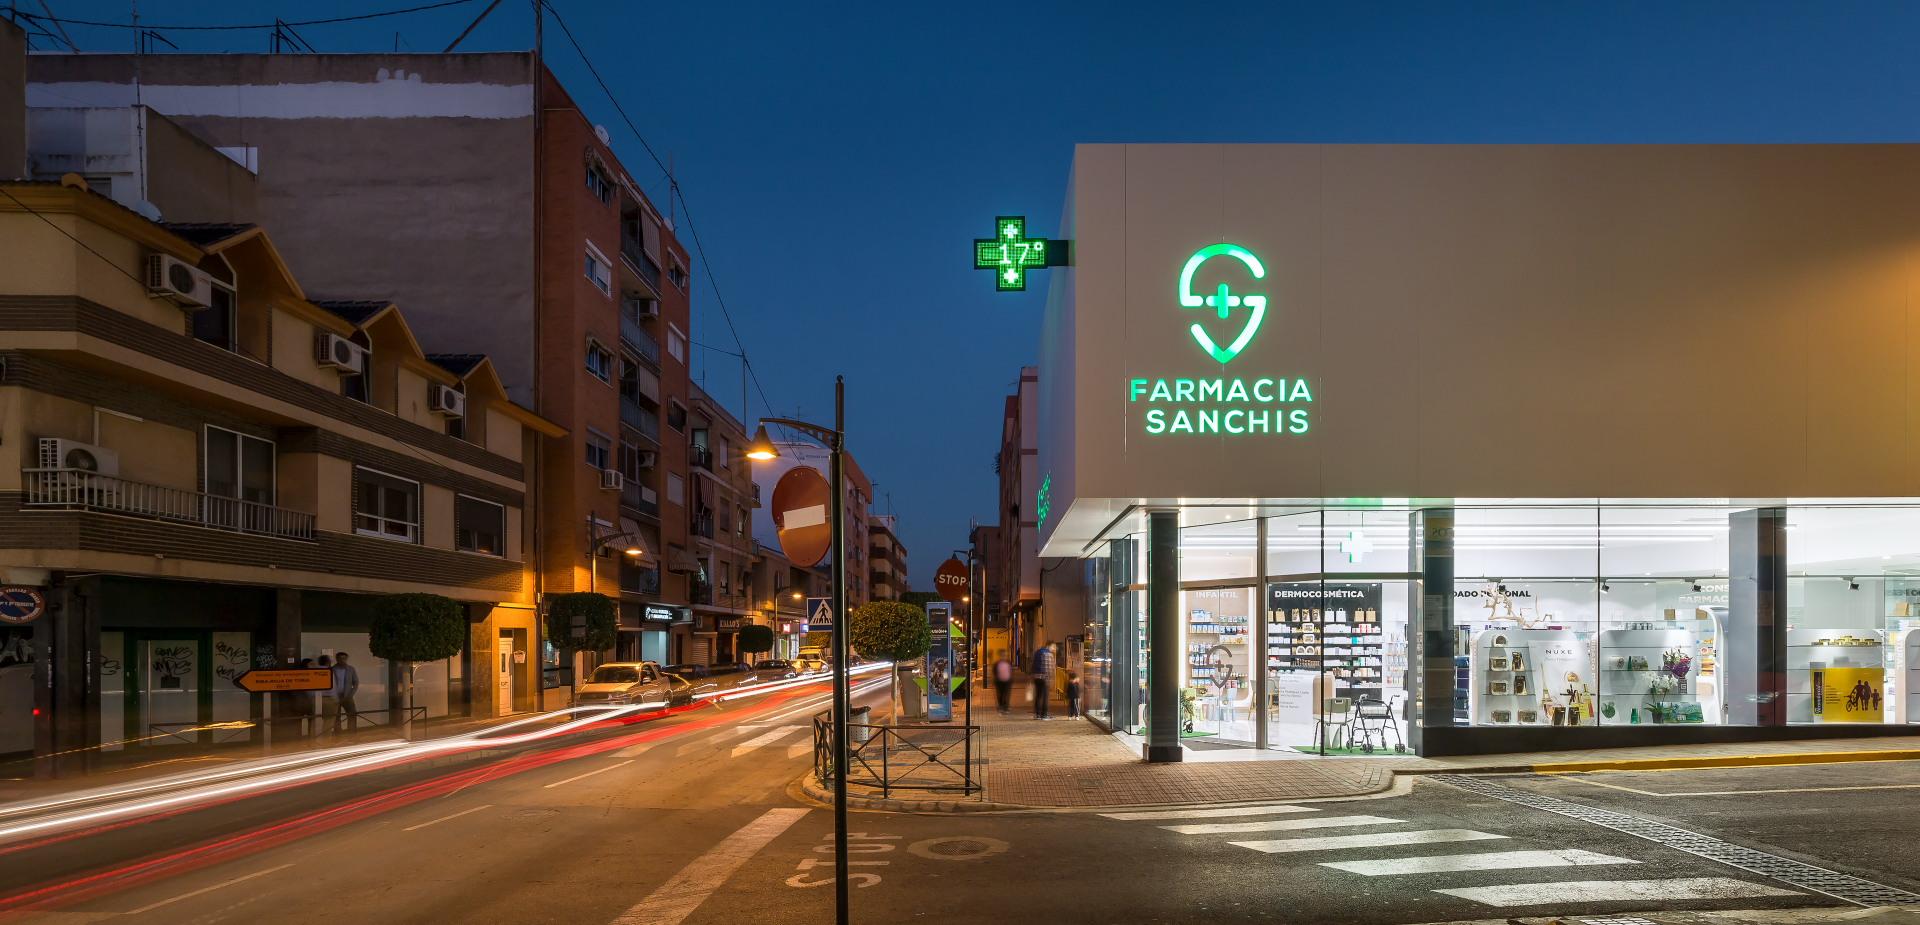 fotografia-arquitectura-valencia-german-cabo-d'estudio-farmacia-sanchis-ribarroja (35)